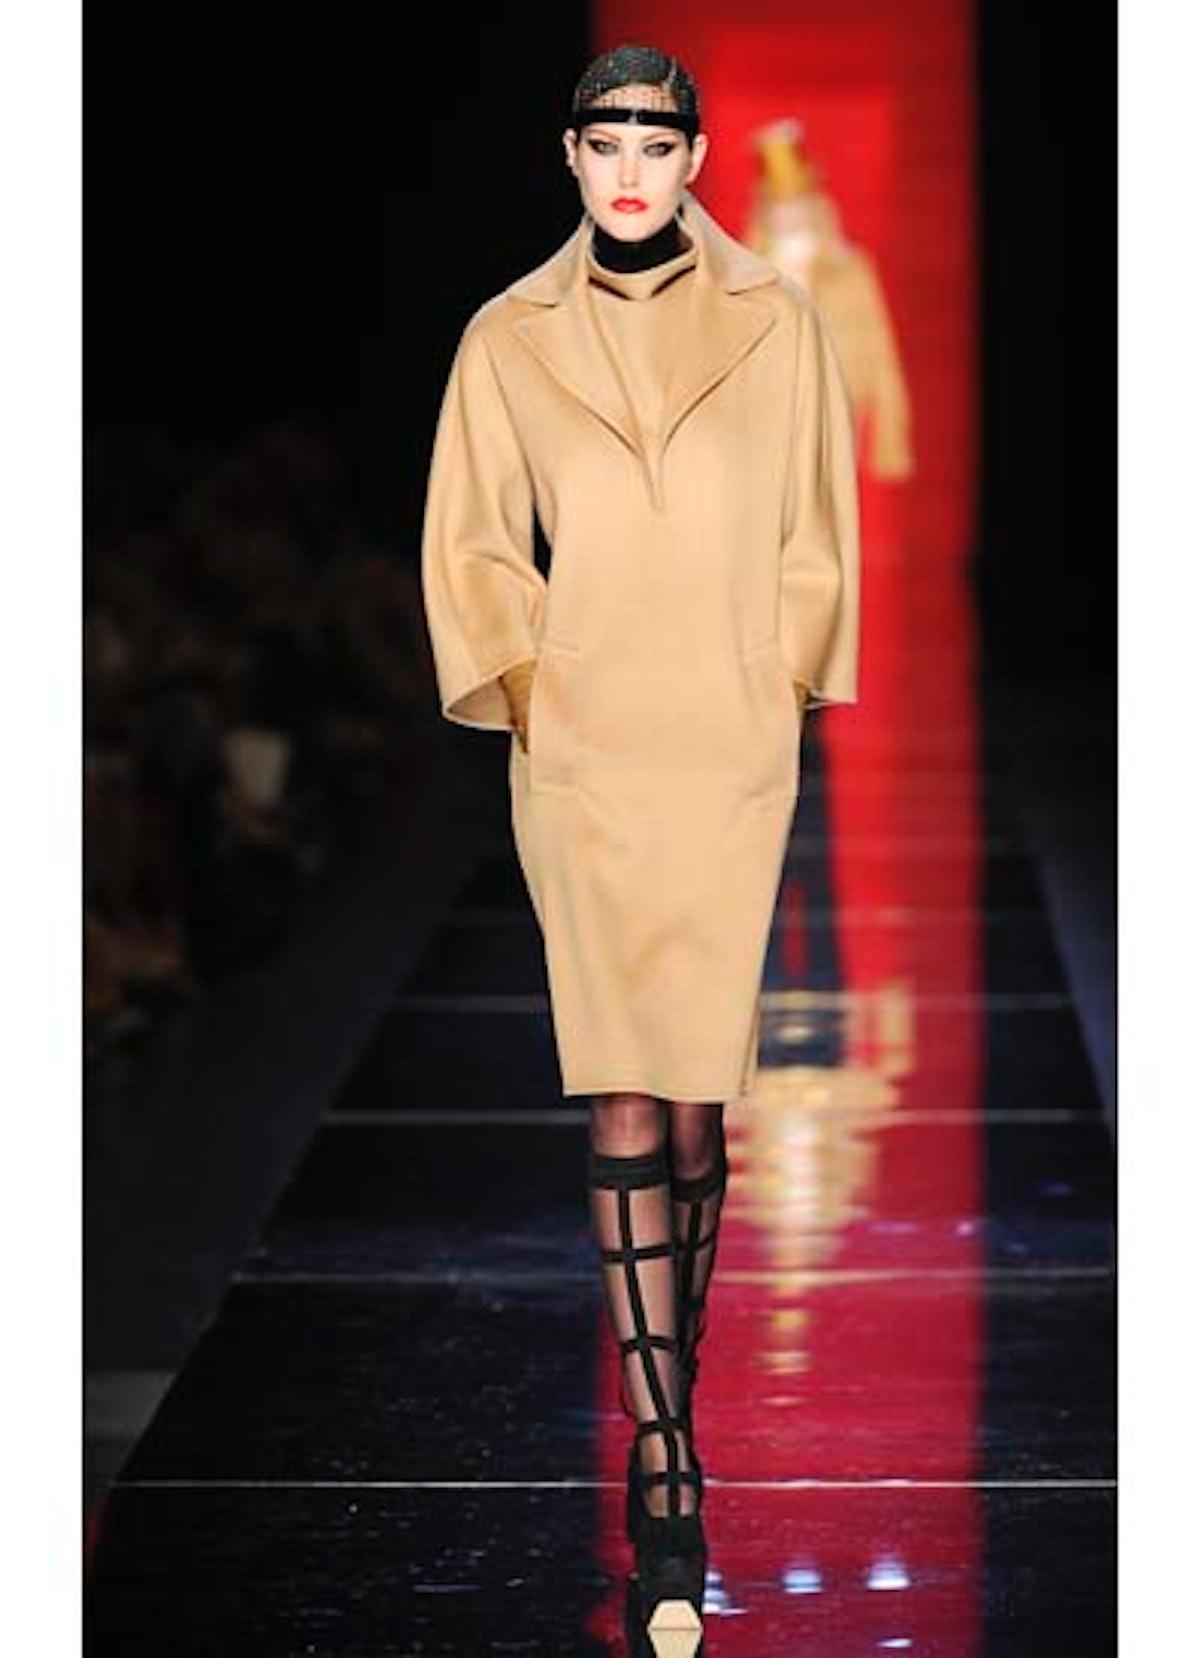 fass-jean-paul-gaultier-couture-2012-runway-19-v.jpg